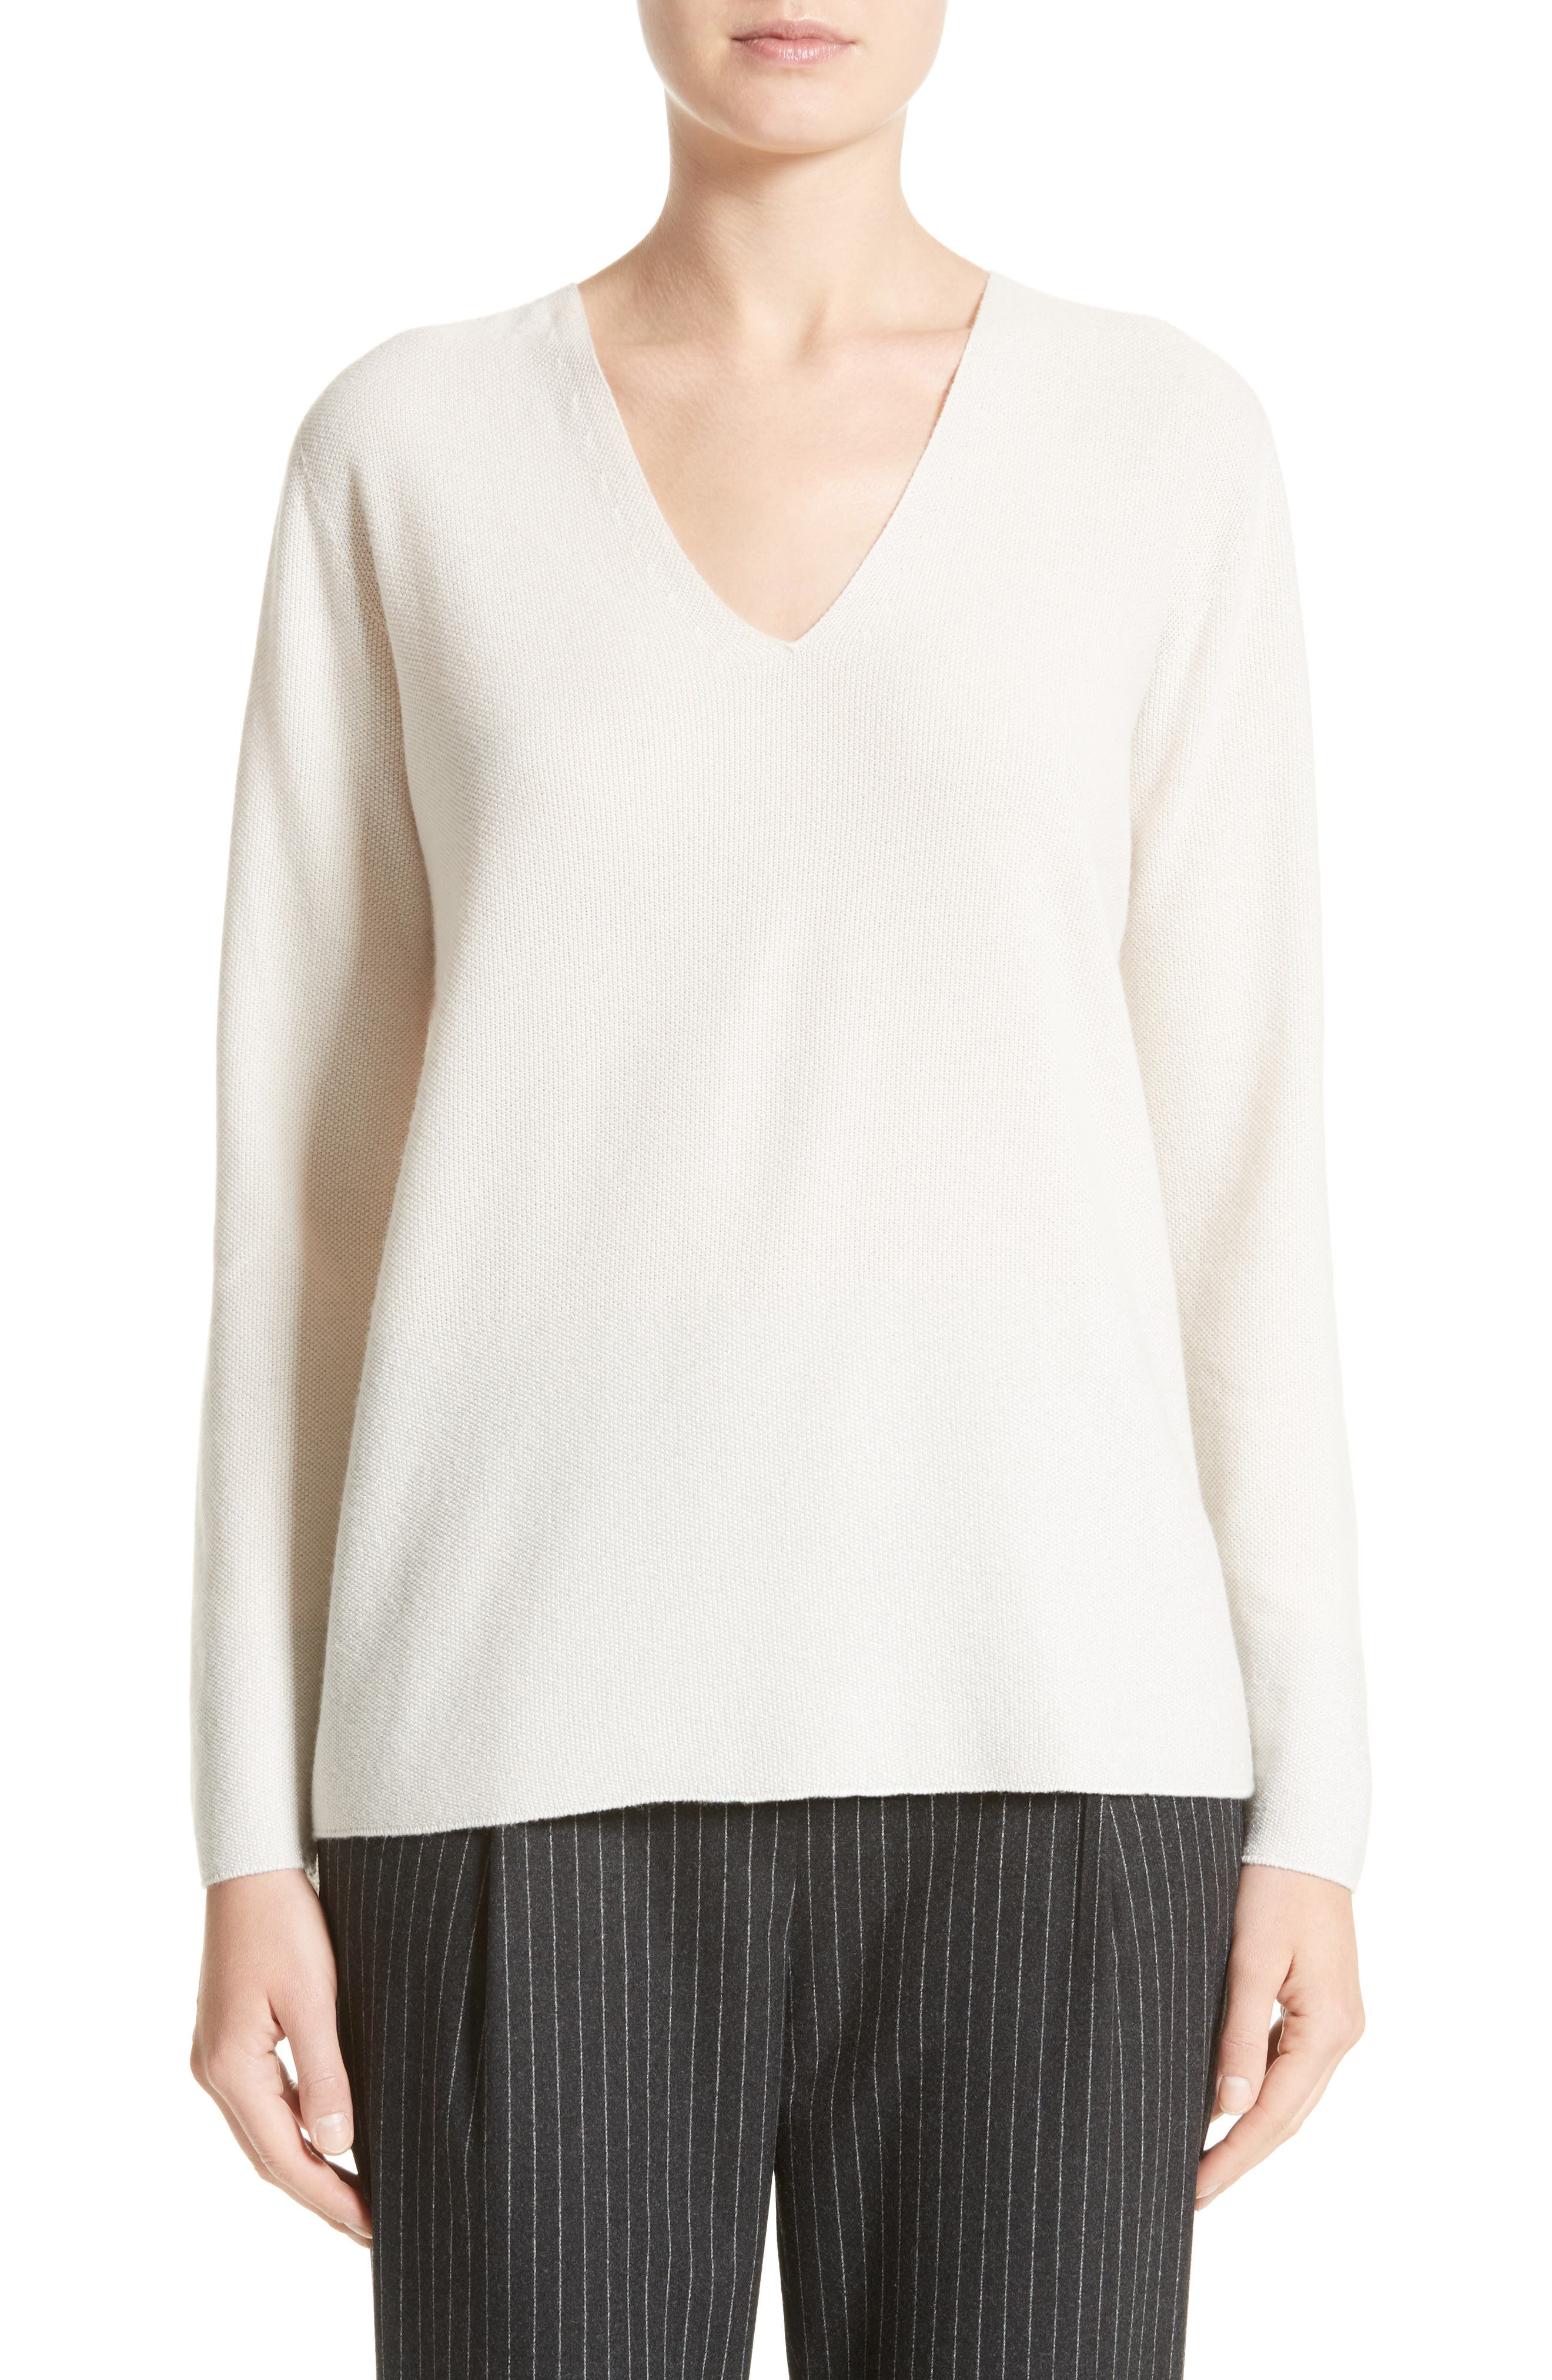 Fabiana Filippi Wool, Silk & Cashmere Micro Popcorn Stitch Sweater